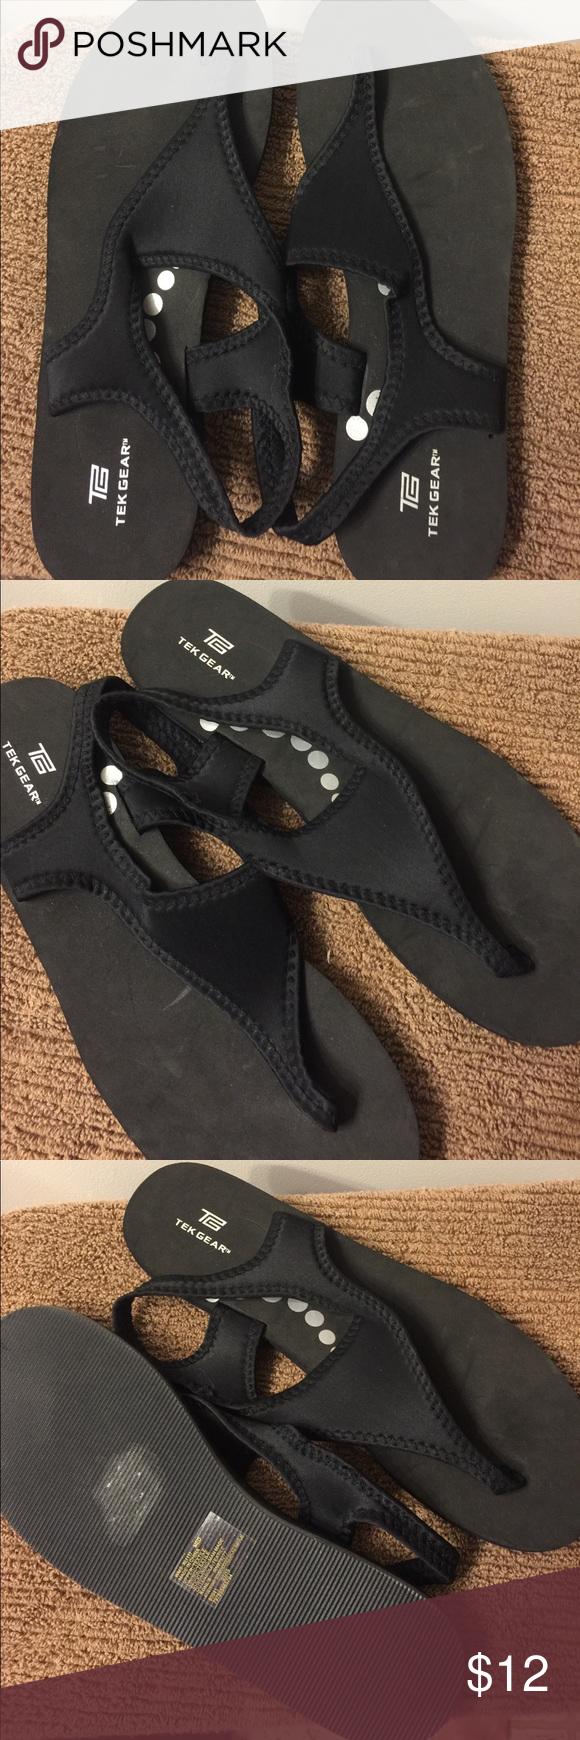 Black sandals size 11 - Tek Gear Lightweight Sandals Size 11 12 Tek Gear Black Lightweight Thong Flip Flops Size 11